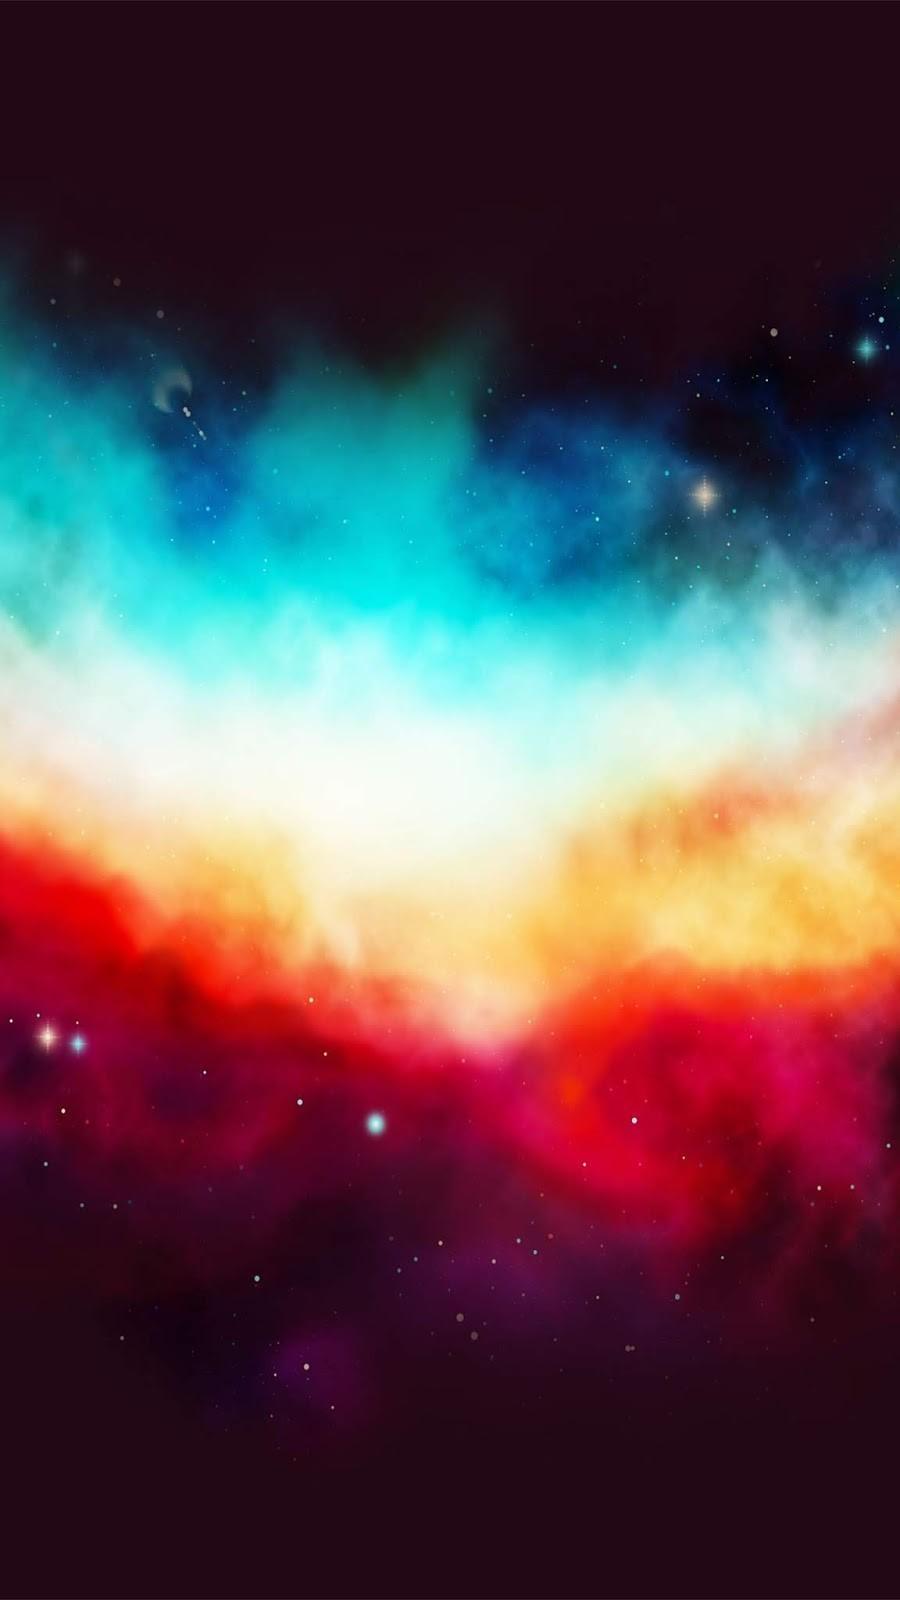 iPhone 1080p wallpaper